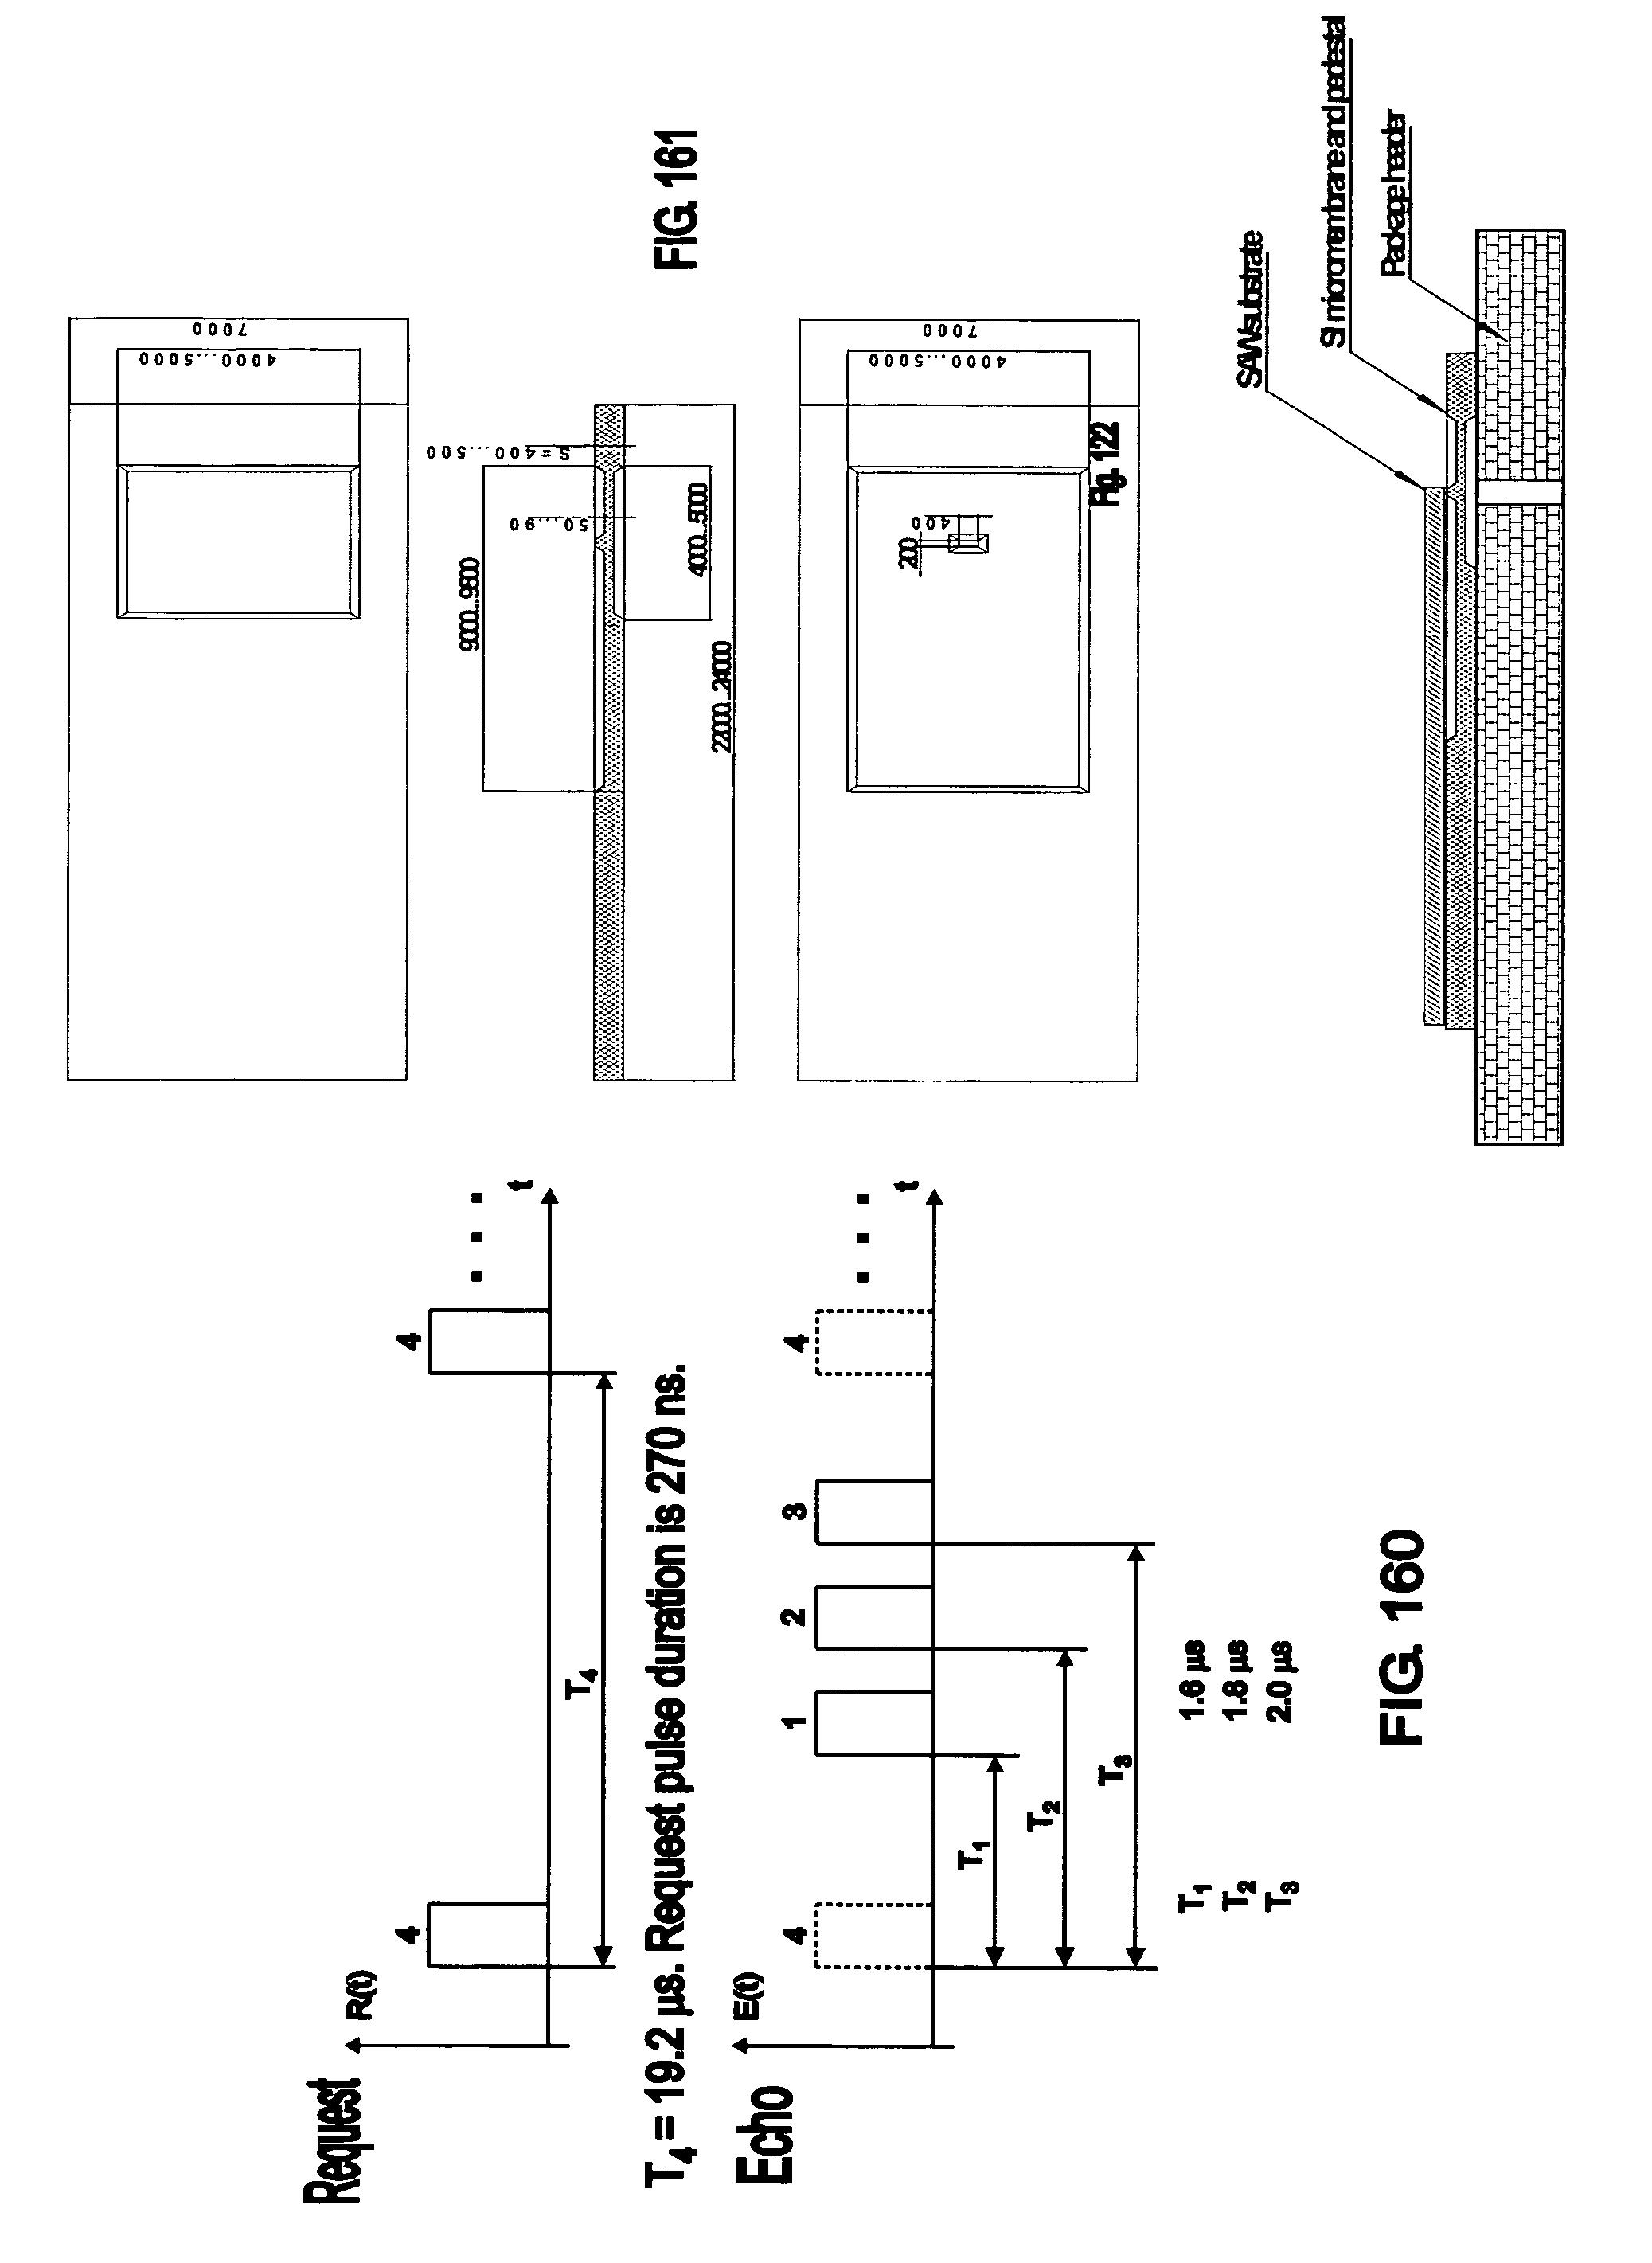 Patent Us 7103460 B1 Audi 80 Wiring Diagram 1992 Service Manual Free Download Schematics Images